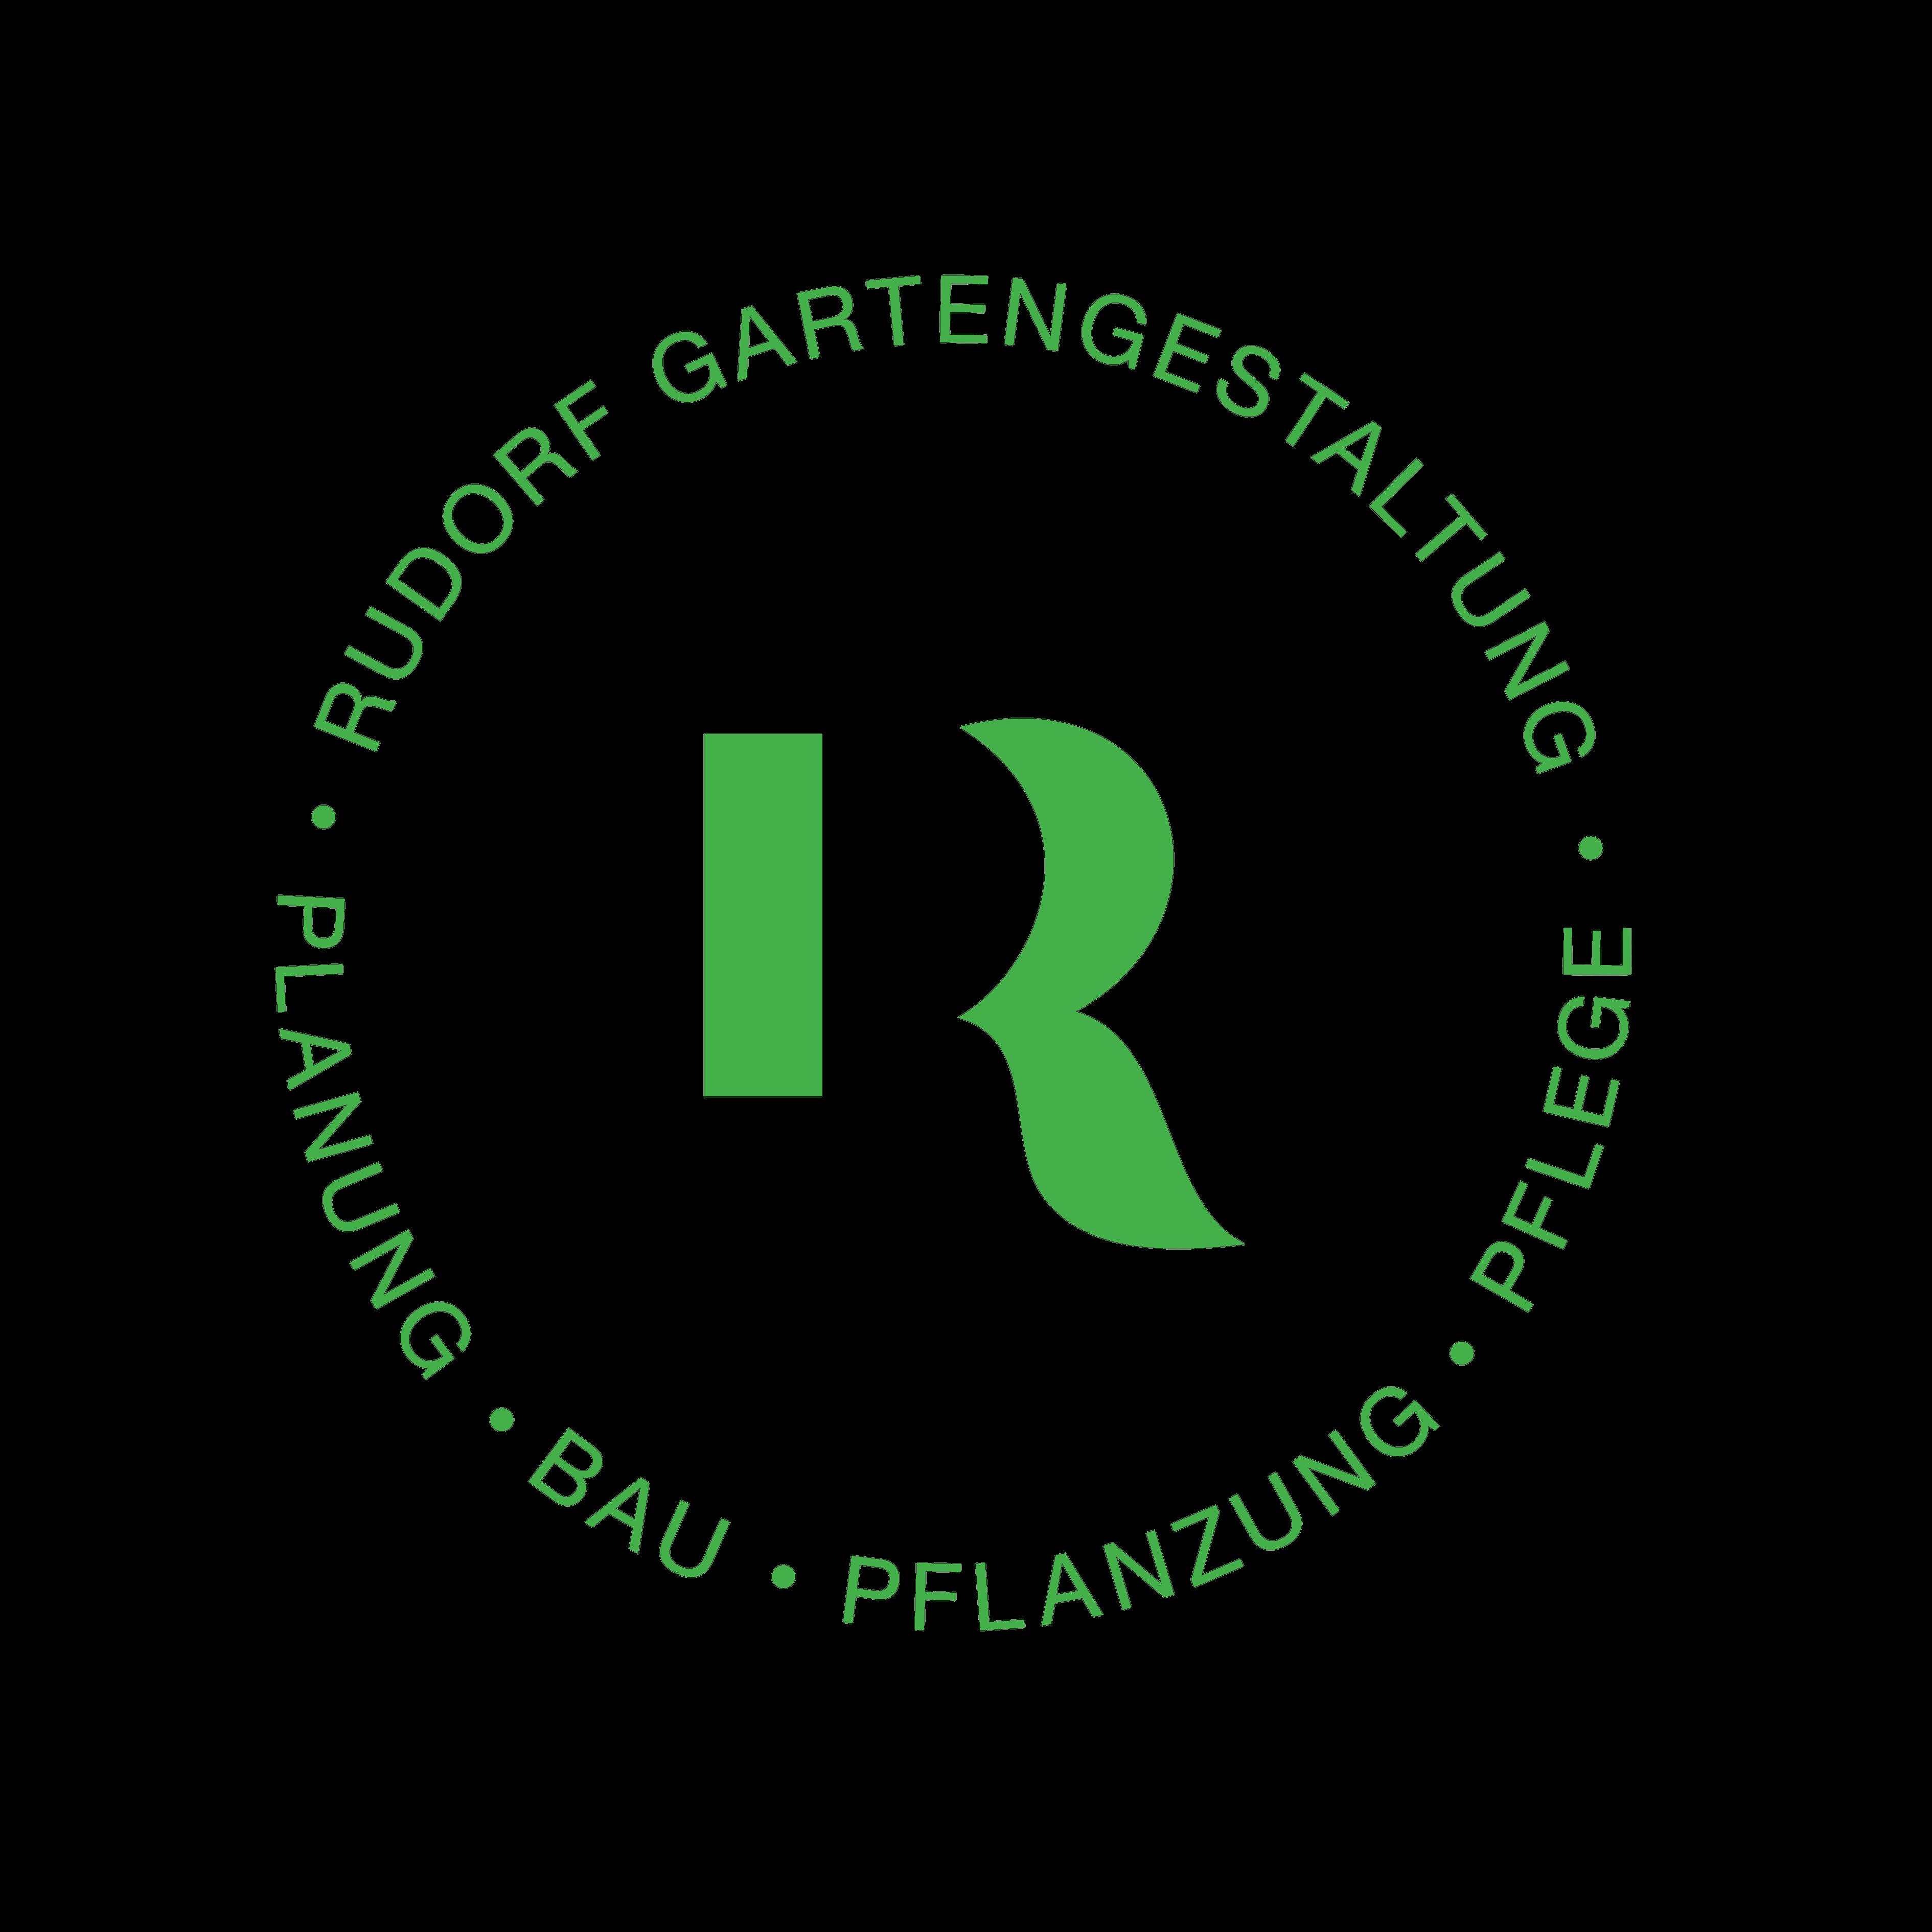 Rudorf Gartengestaltung - Gartenplanung - Gartenbau - Gartenpflege